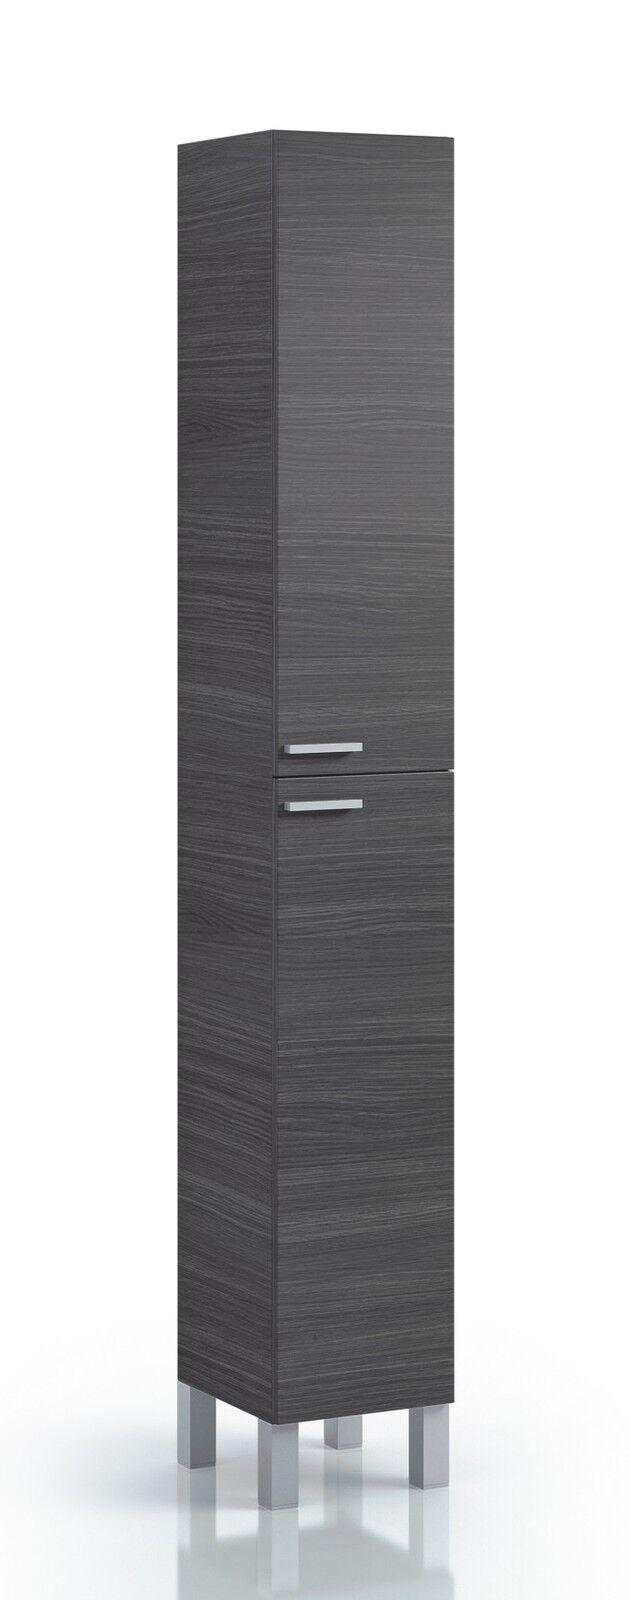 Koncept Tall Narrow Bathroom Cupboard Storage Cabinet soft ...